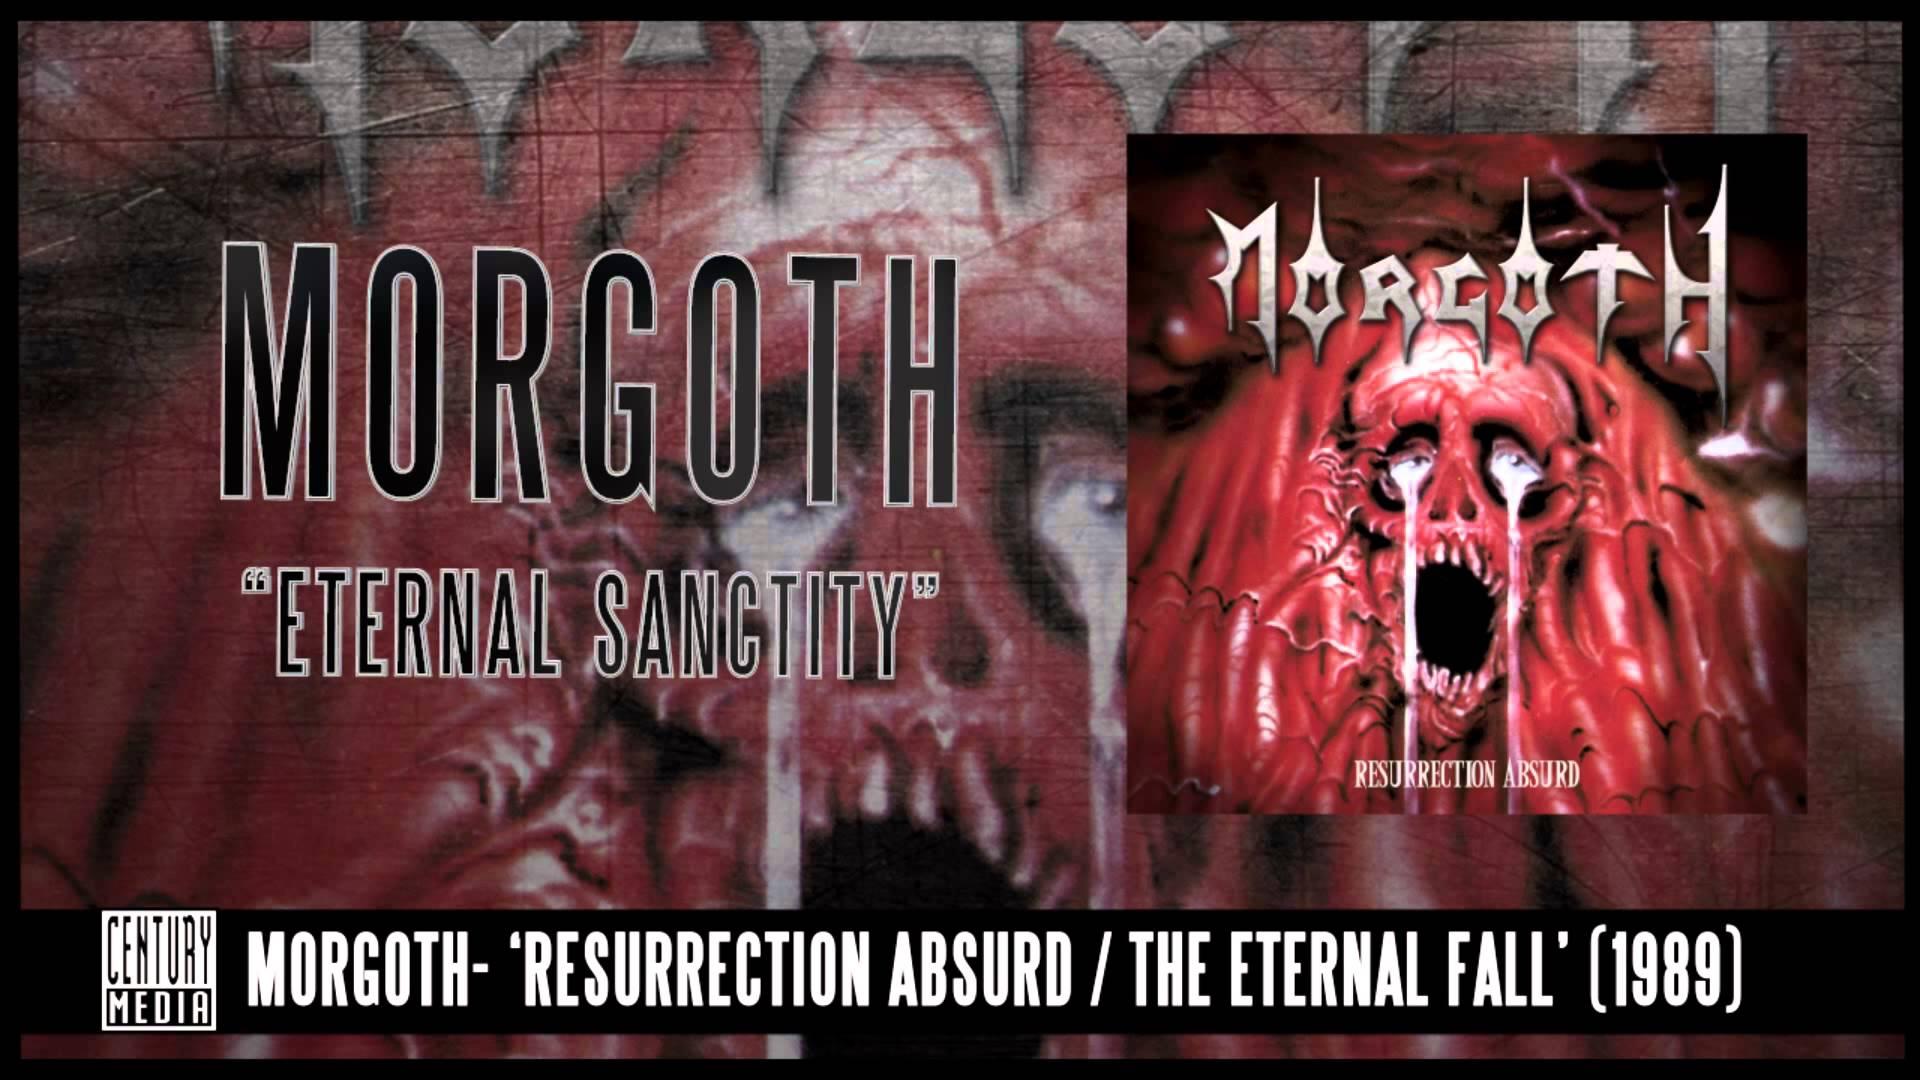 MORGOTH - Eternal Sanctity (ALBUM TRACK)